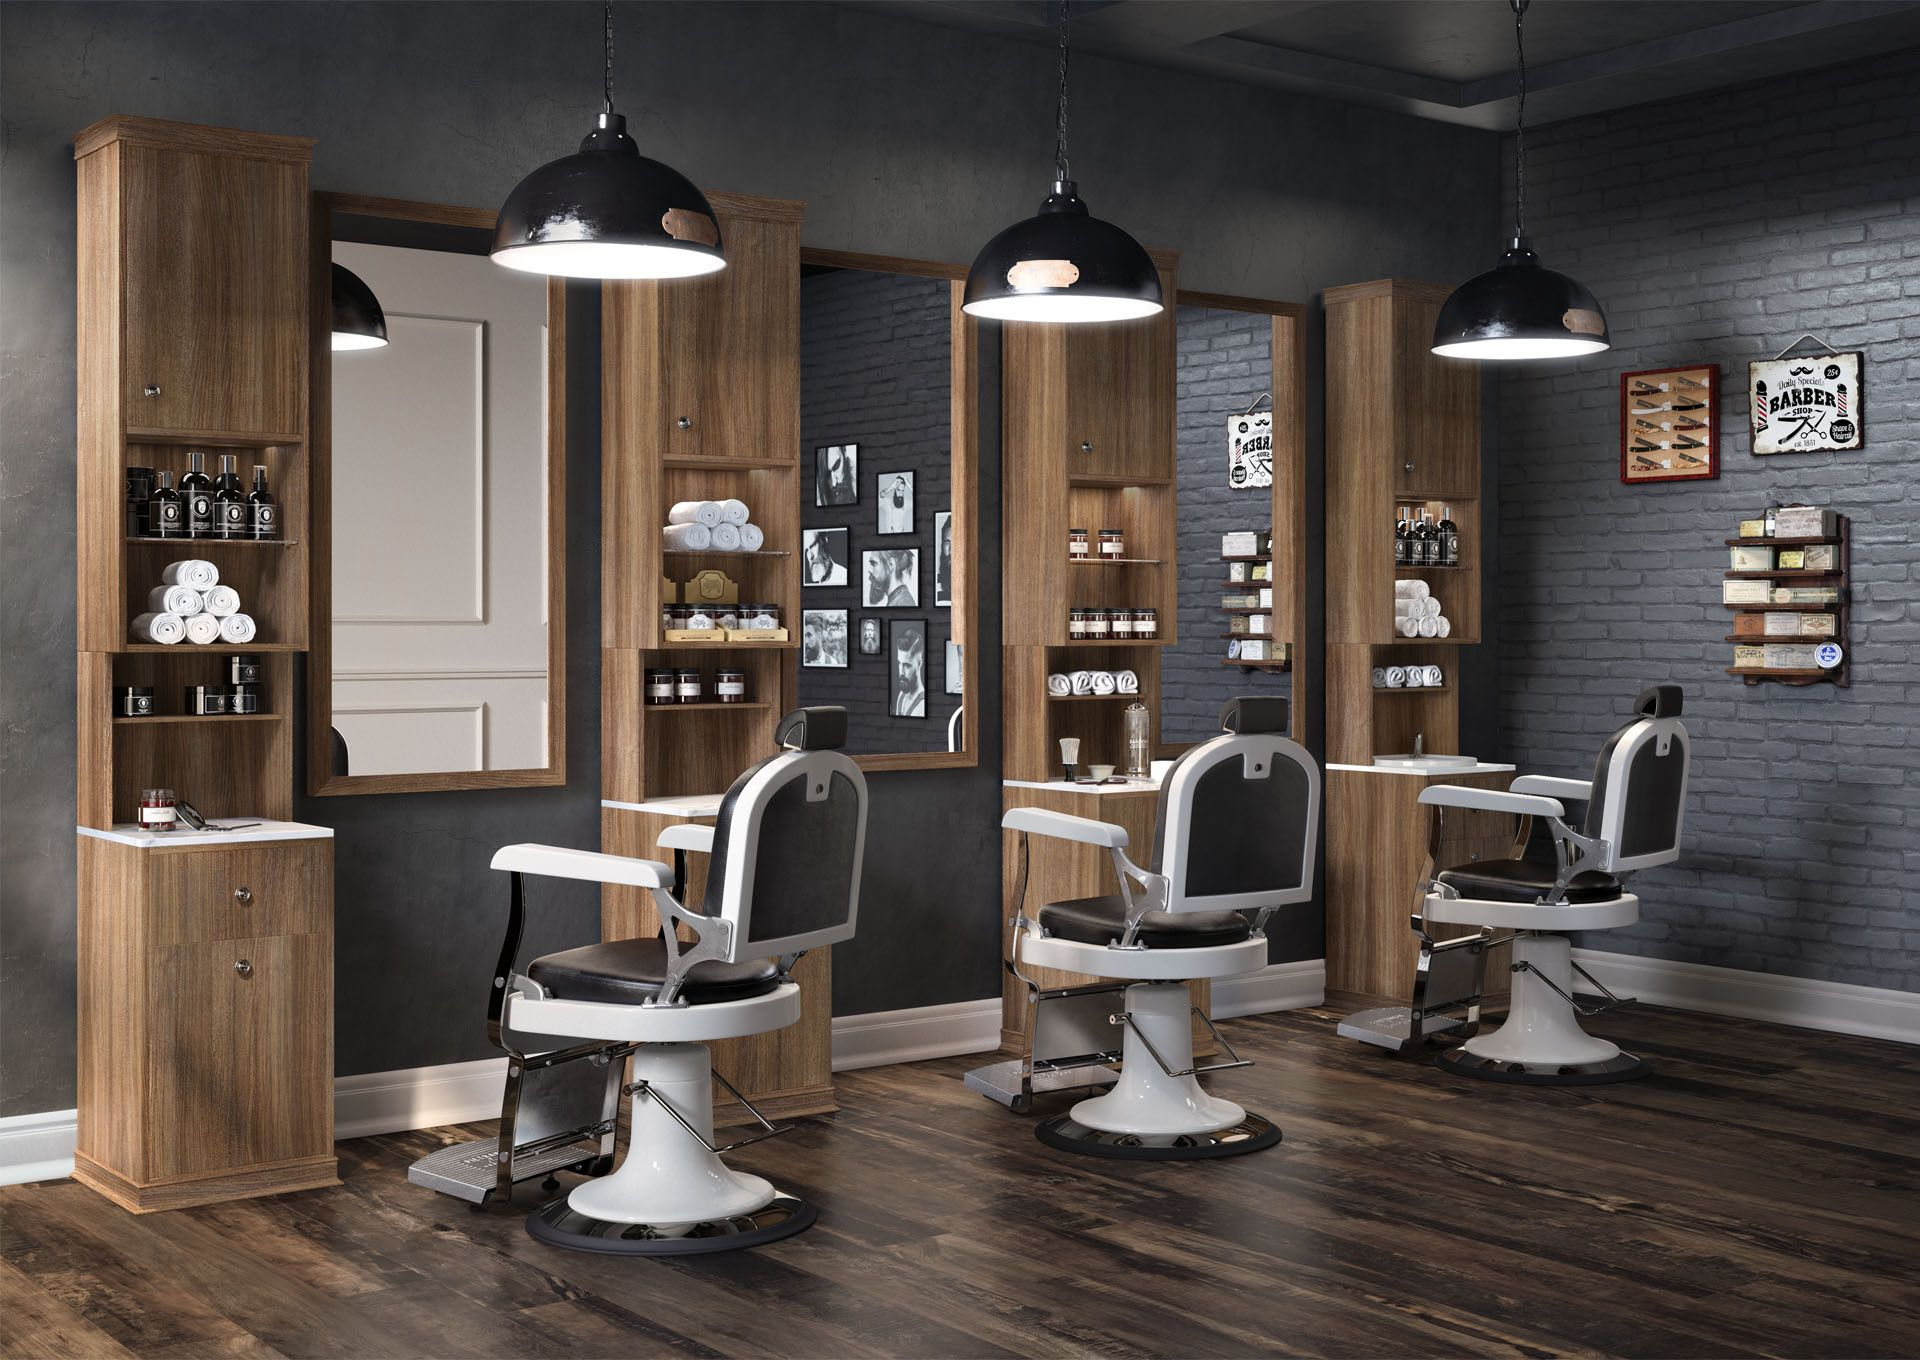 inger mergi la drumeție revelatie mobilier salon design